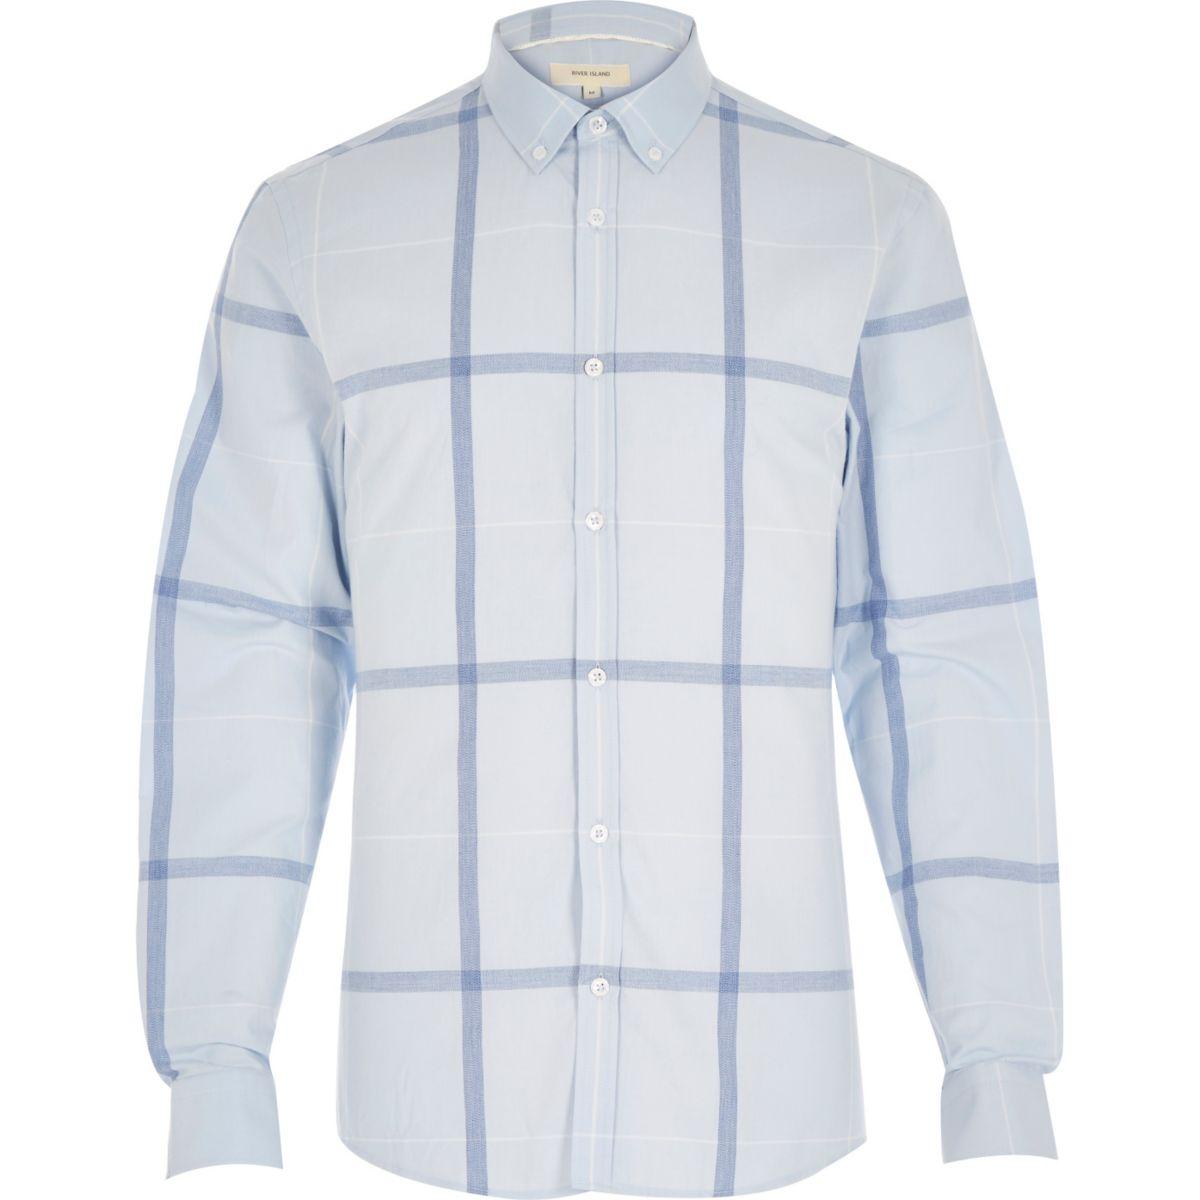 Blauw oversized ruitjesoverhemd